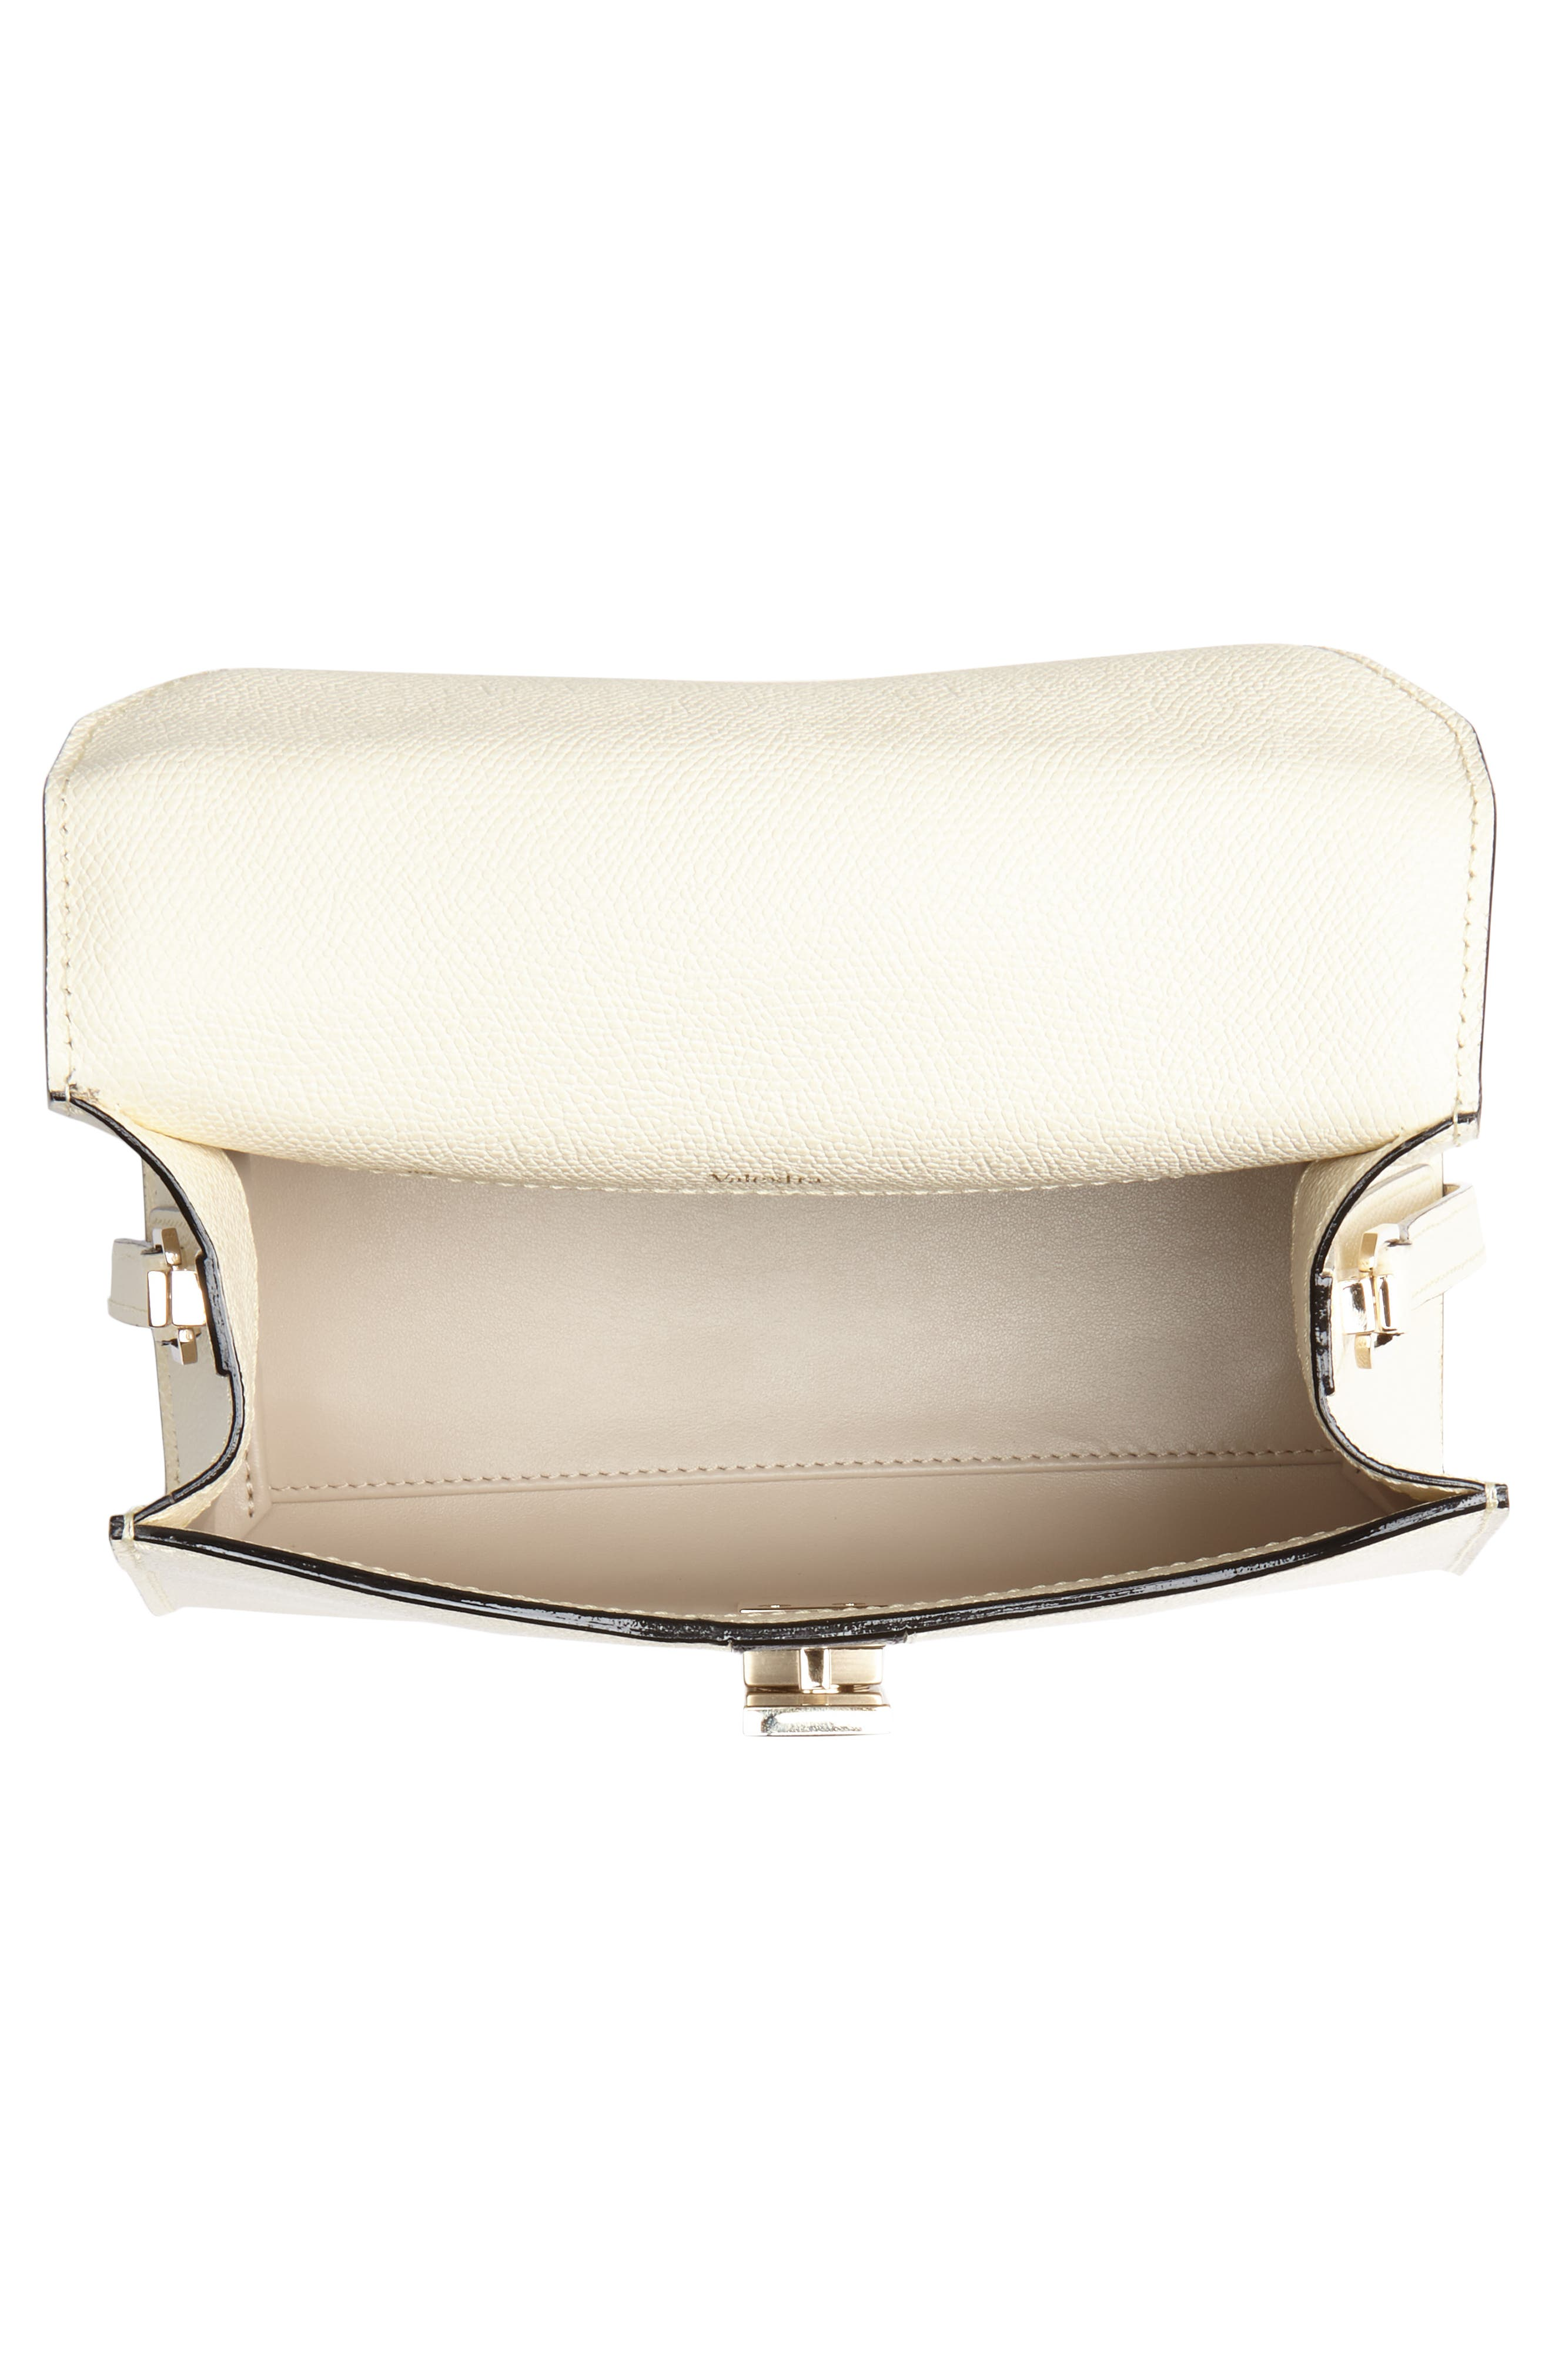 Mini Iside Top Handle Bag,                             Alternate thumbnail 4, color,                             WHITE/ BLACK